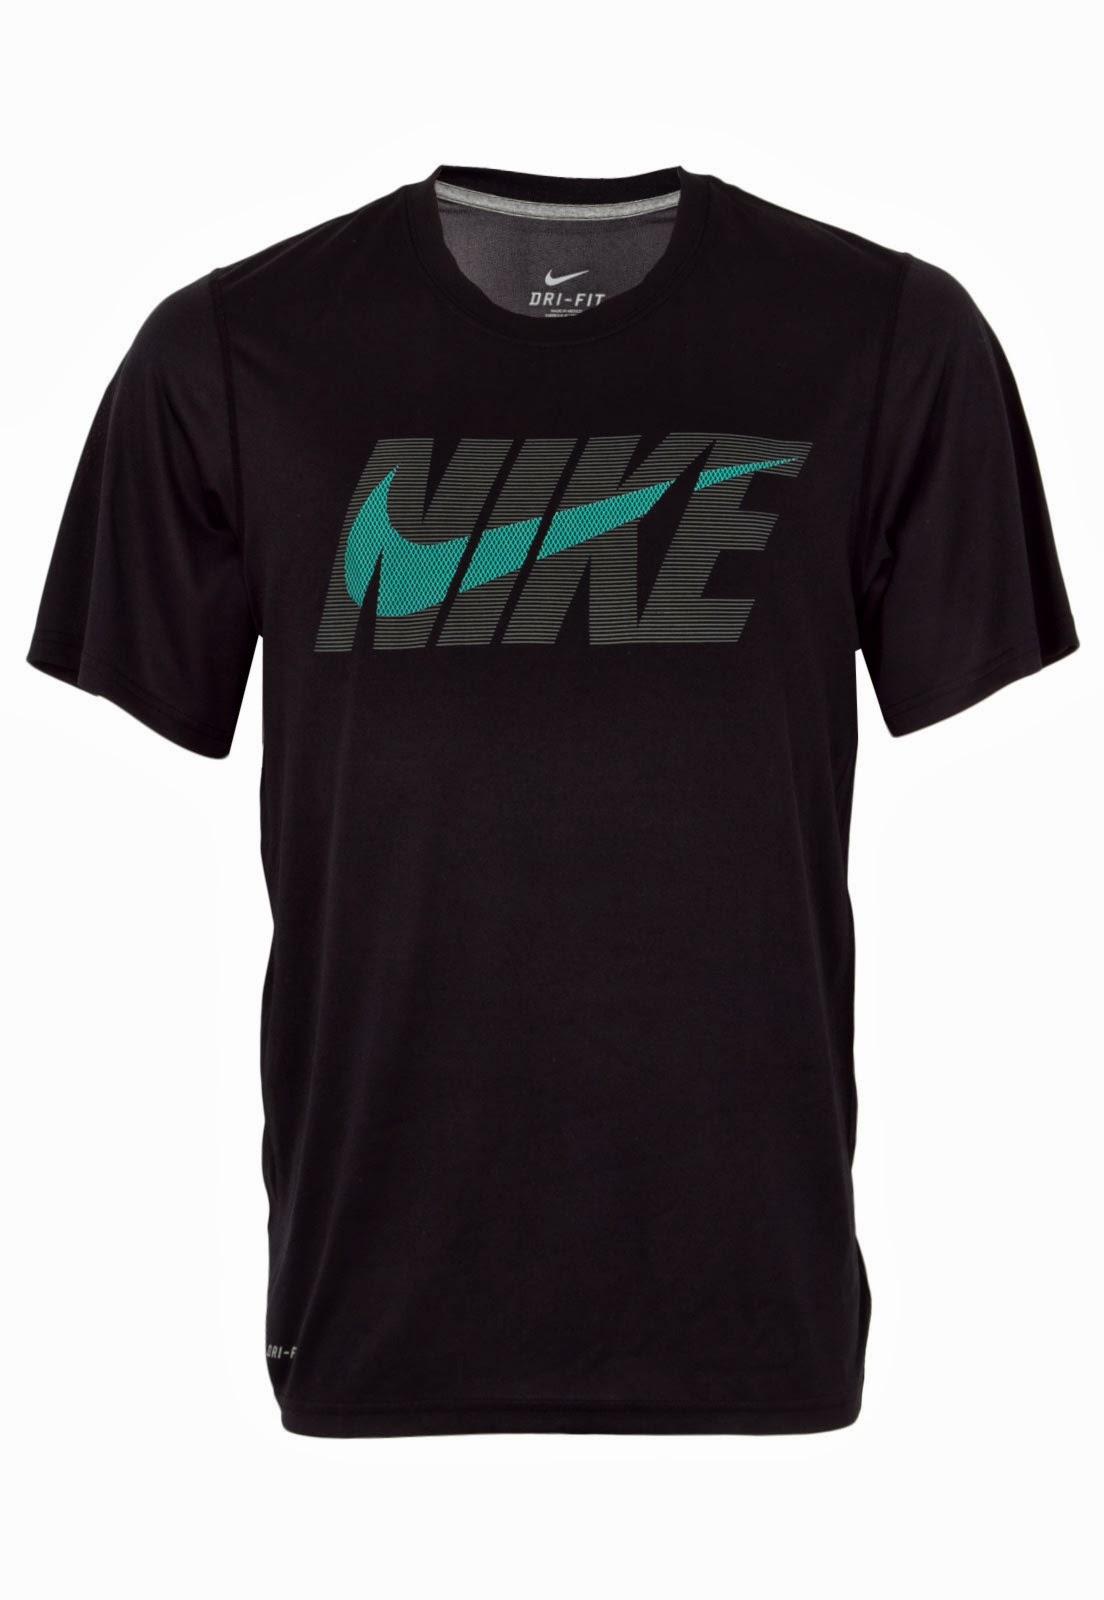 aa91916409 http   www.dafiti.com.br Camiseta-Nike-Legend-Swoosh-Preta-1216634.html af 1294241758 utm source 1294241758 utm medium af utm content linkdireto a aid   ...